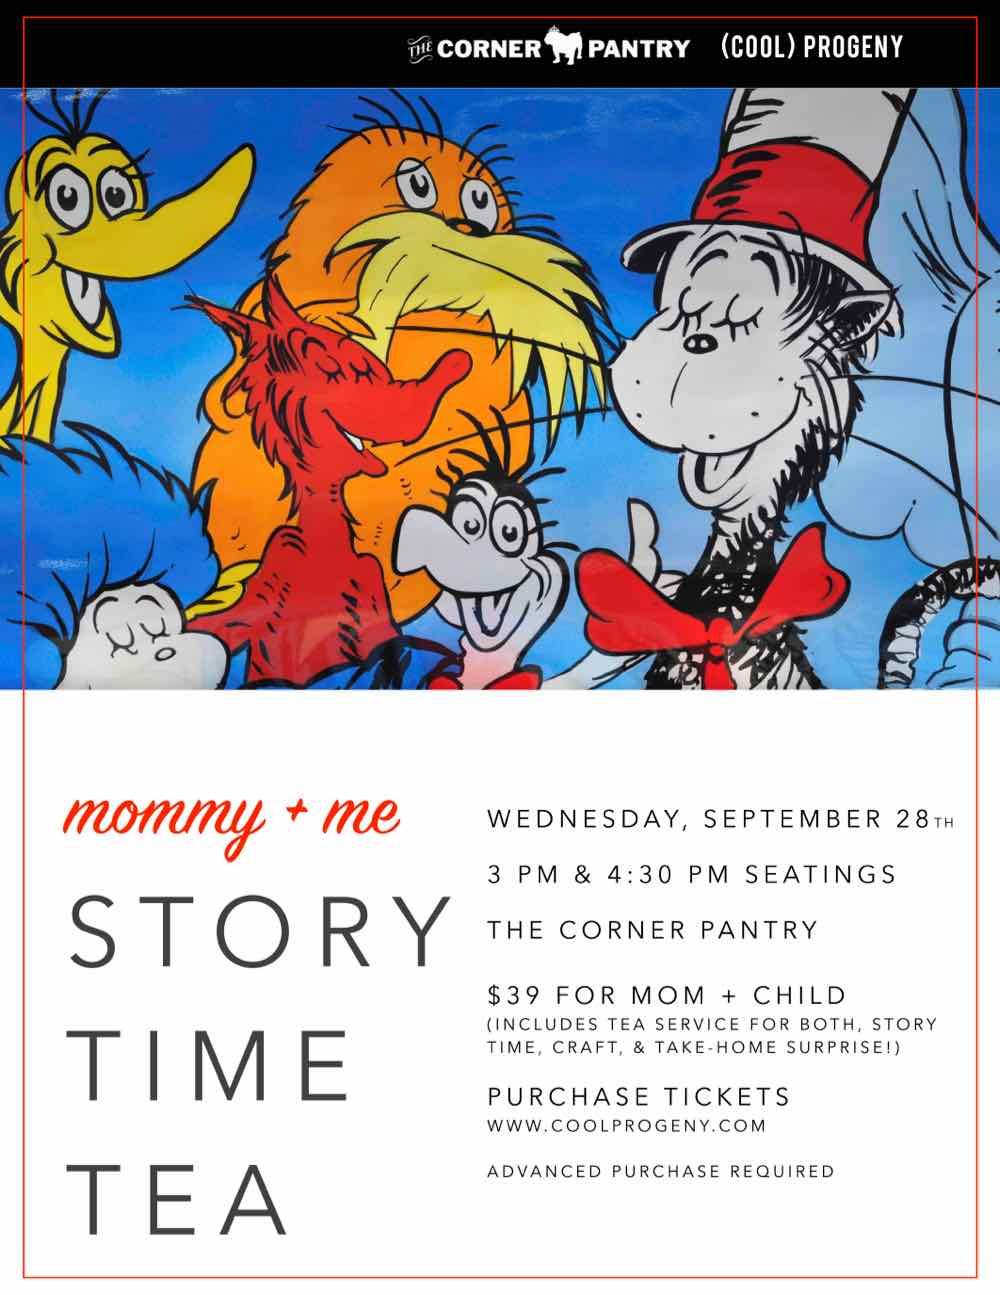 Dr. Seuss Story Time Tea - (cool) progeny